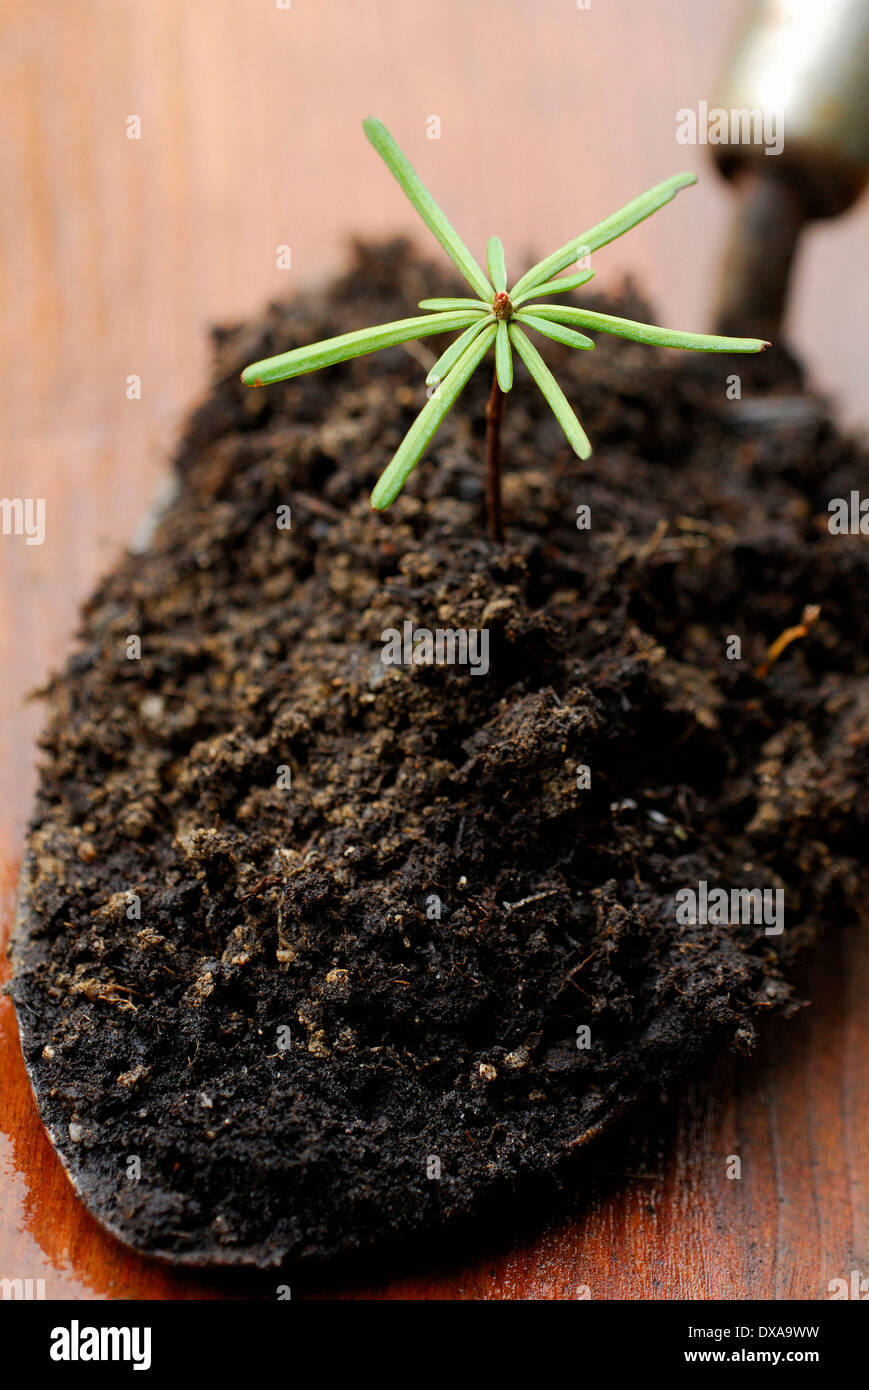 Spruce seedling - Stock Image